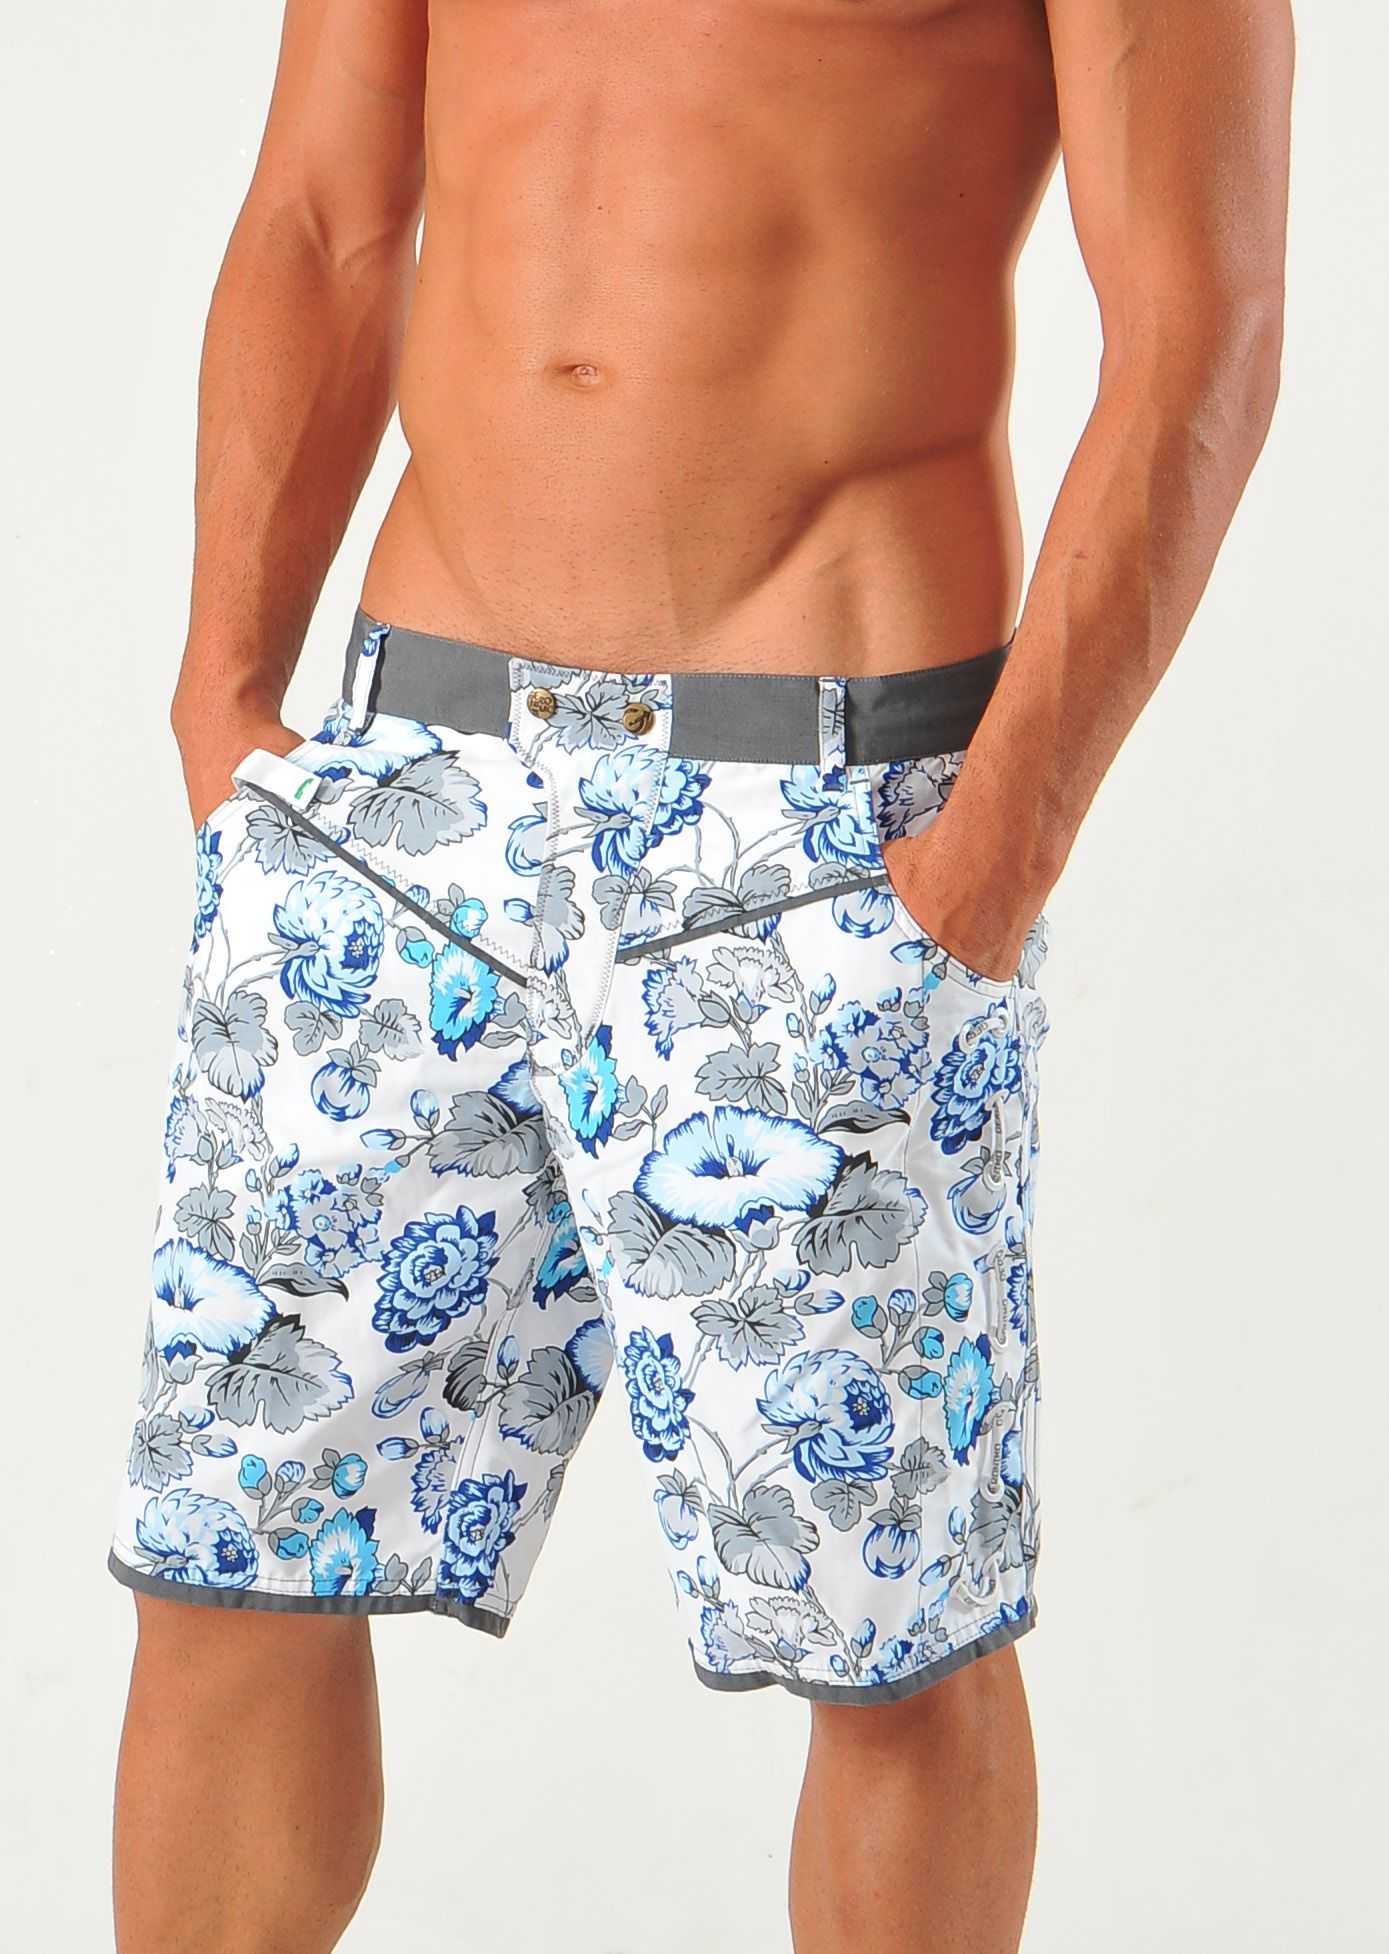 bda2ed87fe Geronimo G-Short. Sexy low-rise Board Shorts   Geronimo Swimwear ...